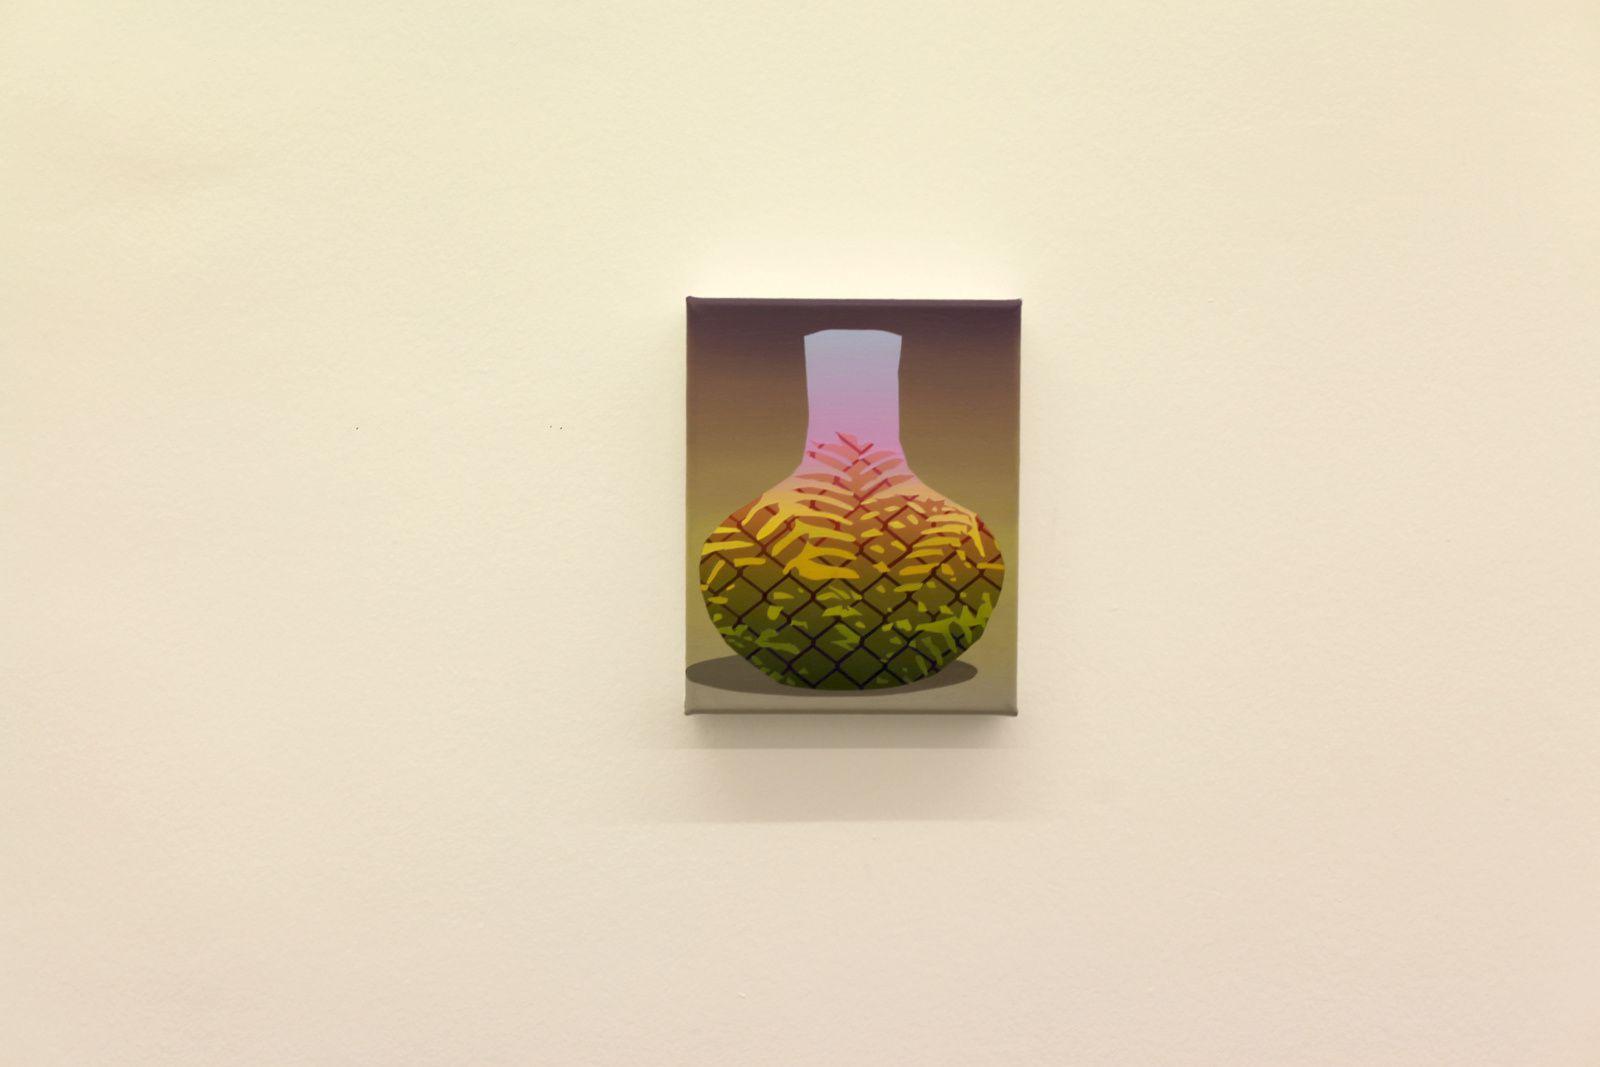 """Muddy Water"", 2018 d'Amélie BERTRAND - Courtesy Galerie Semiose © Photo Éric Simon"